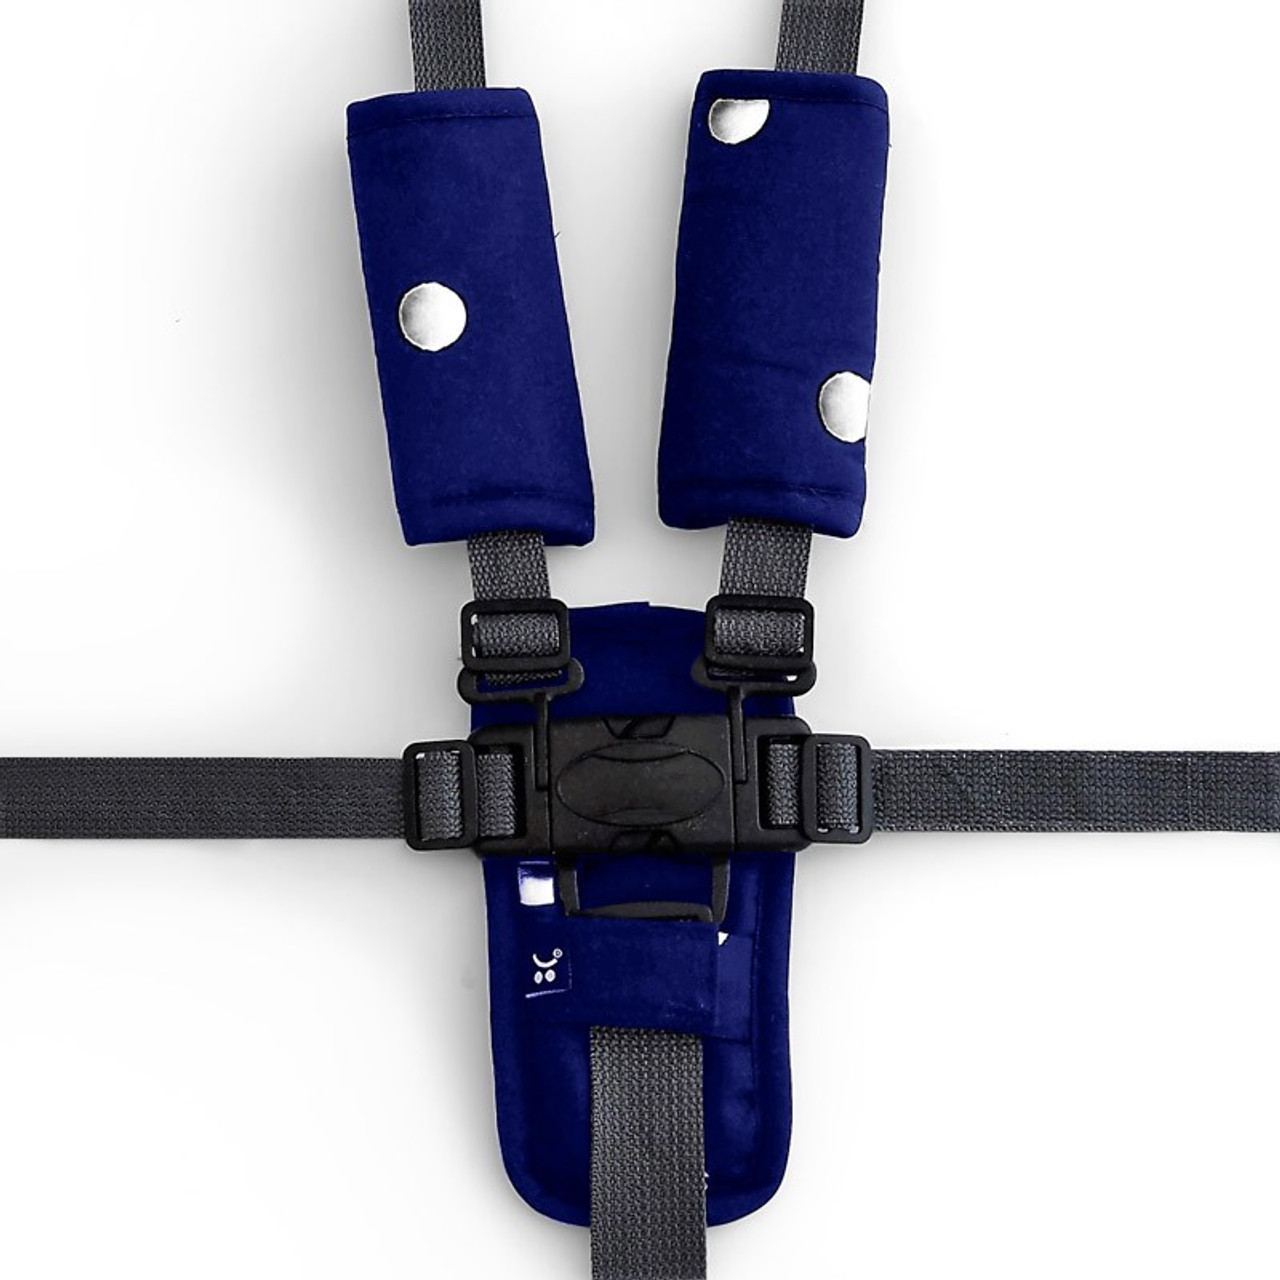 Outlook Get Foiled Pram Harness Cover Set - NAVY